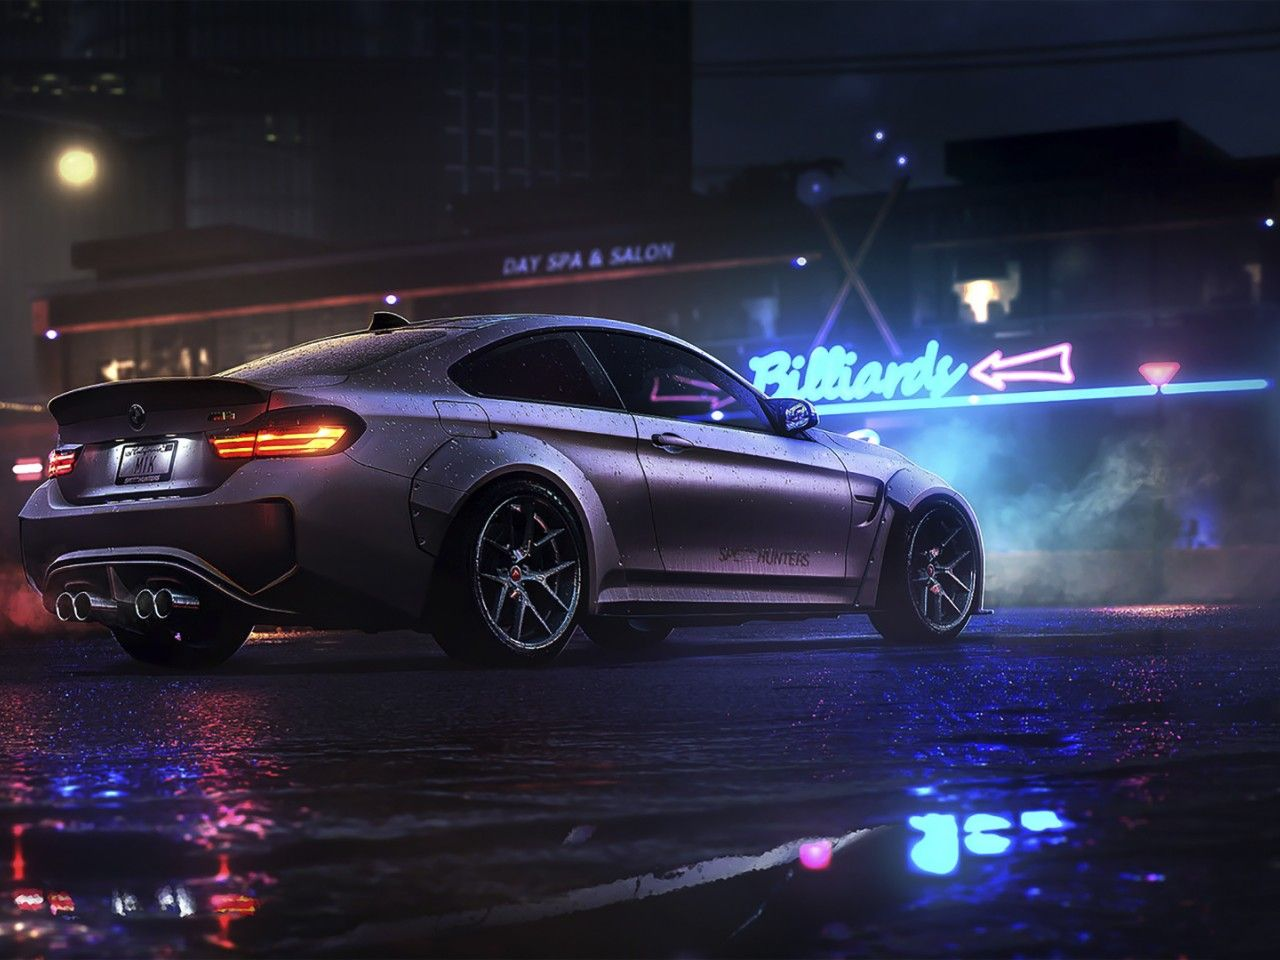 Download Wallpaper Bmw M4 Sport Car Rain Dark Night Rear Bmw Resolution 1280x960 Bmw Bmw Coupe Need For Speed